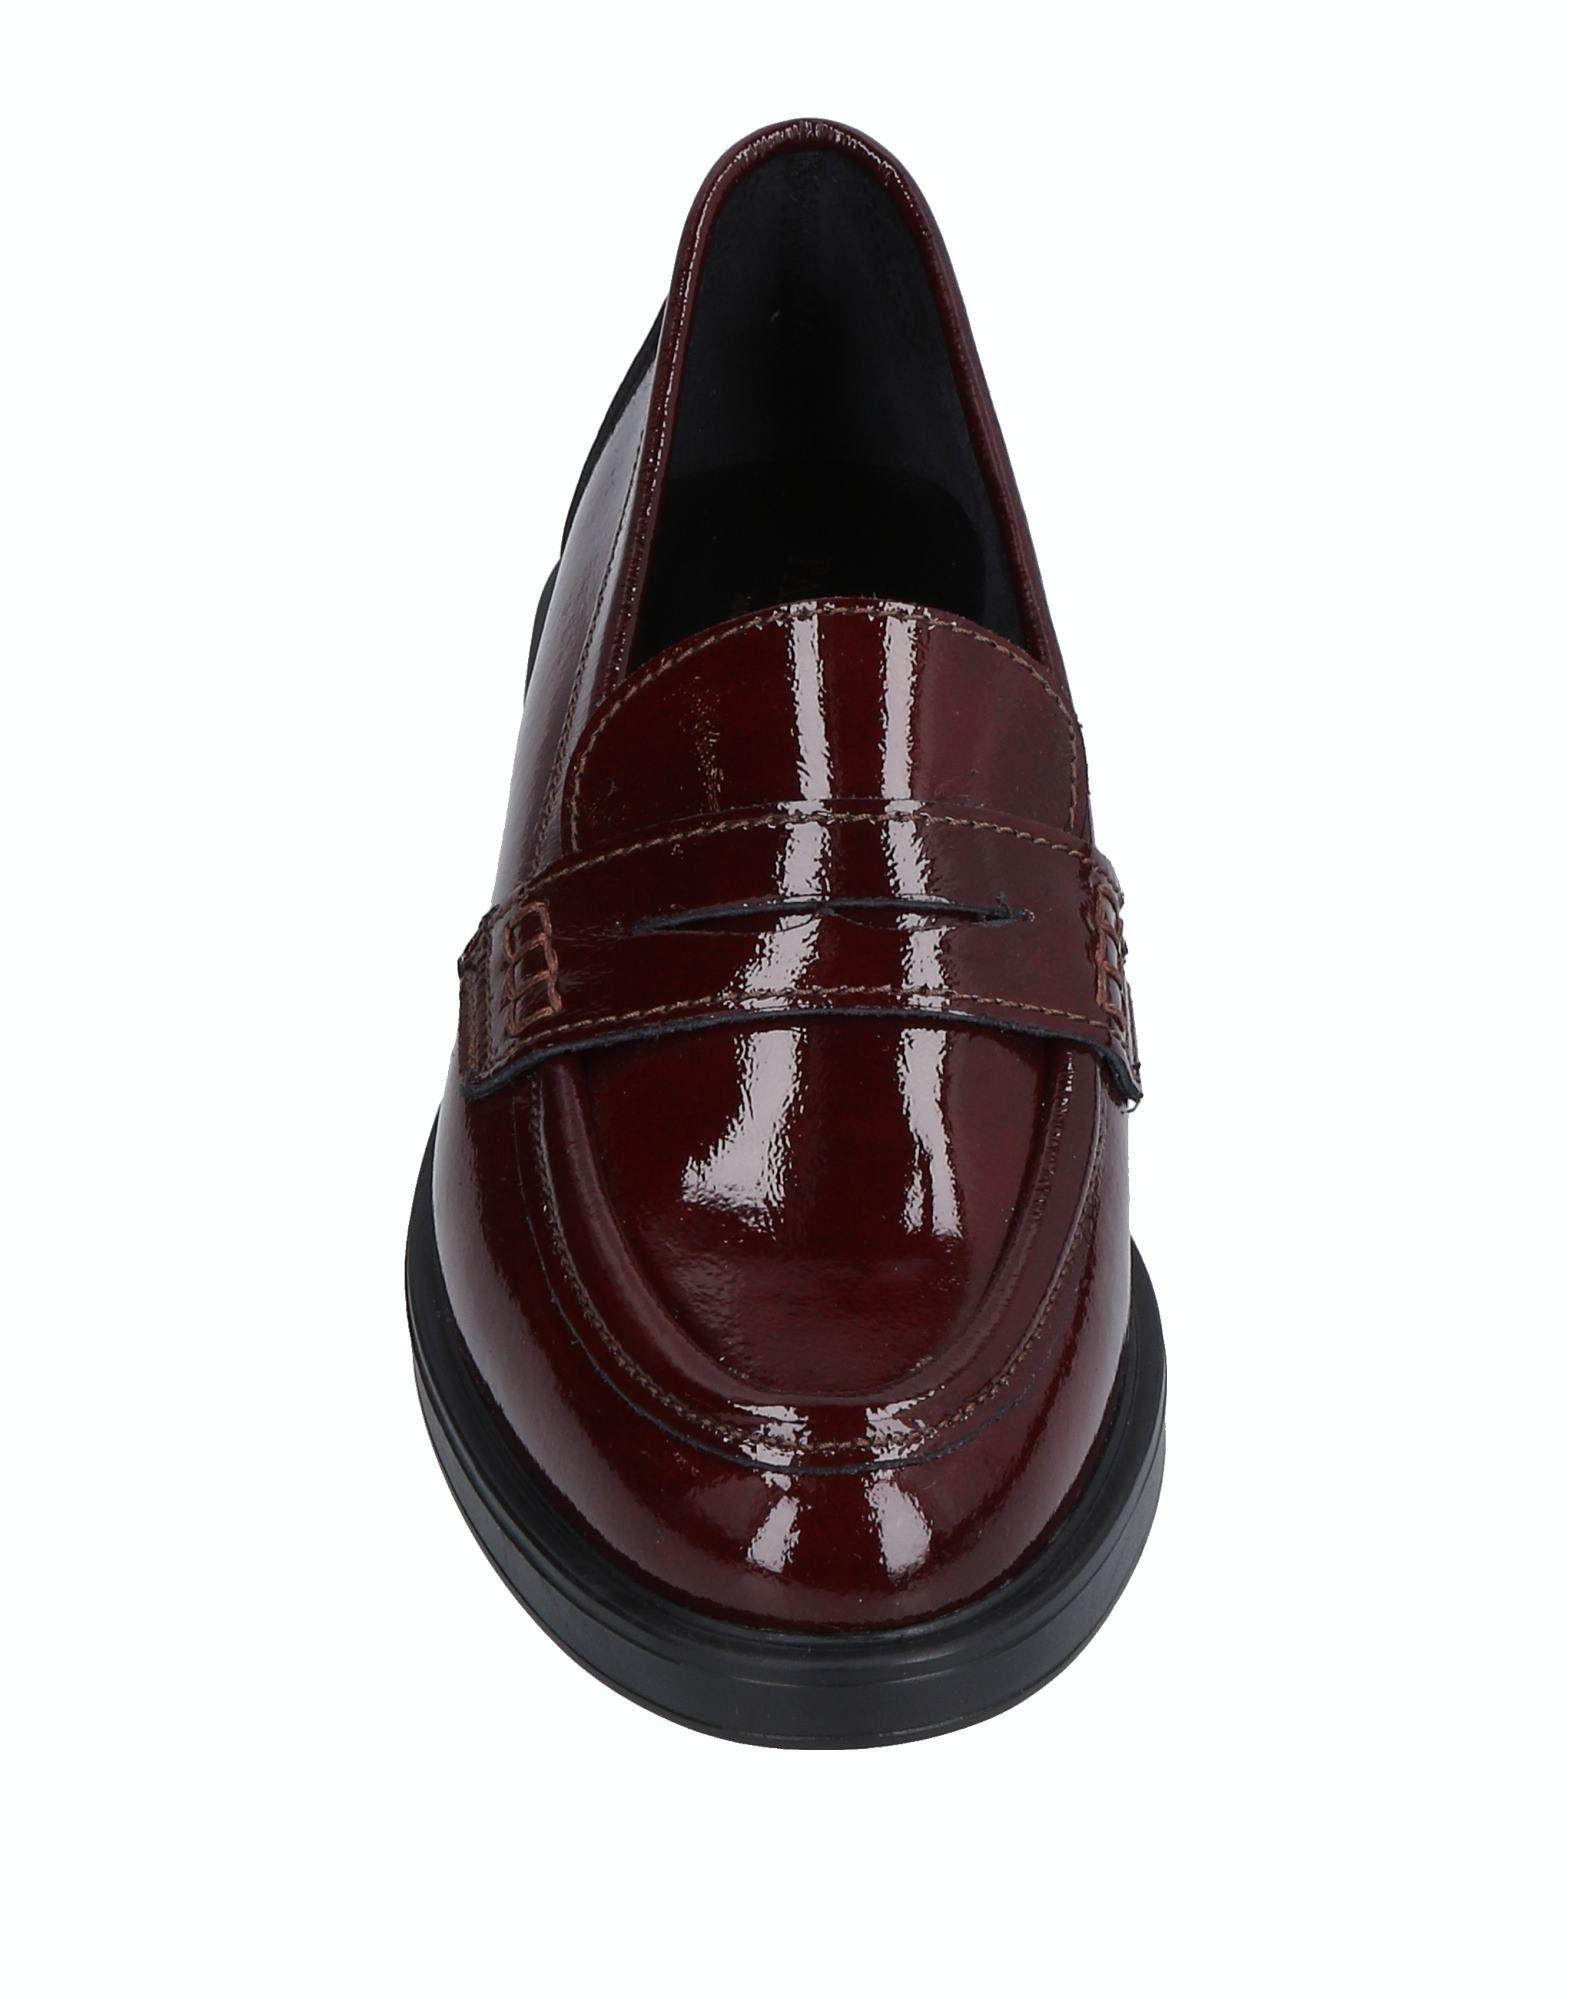 Carlo Pazolini Mokassins Damen beliebte  11510416NO Gute Qualität beliebte Damen Schuhe 3f05ee